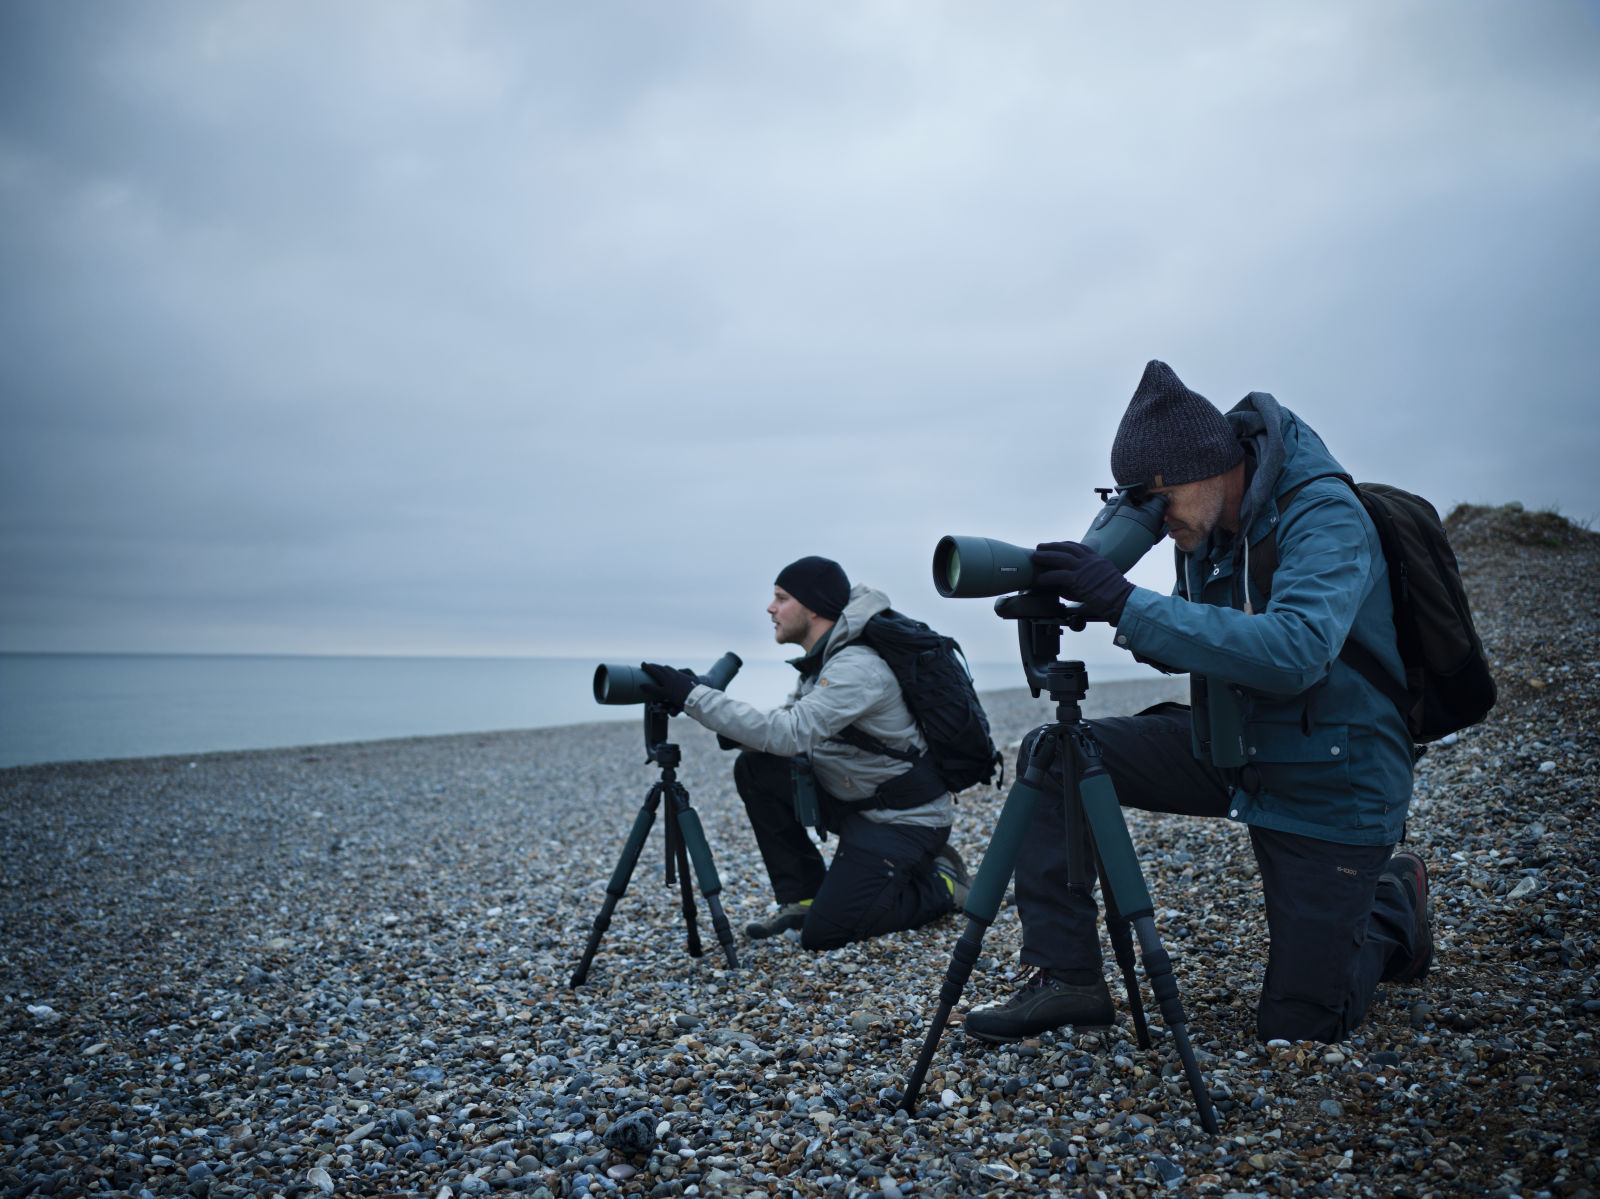 Birding at the coast with the ATX/STX/BTX spotting scopes.